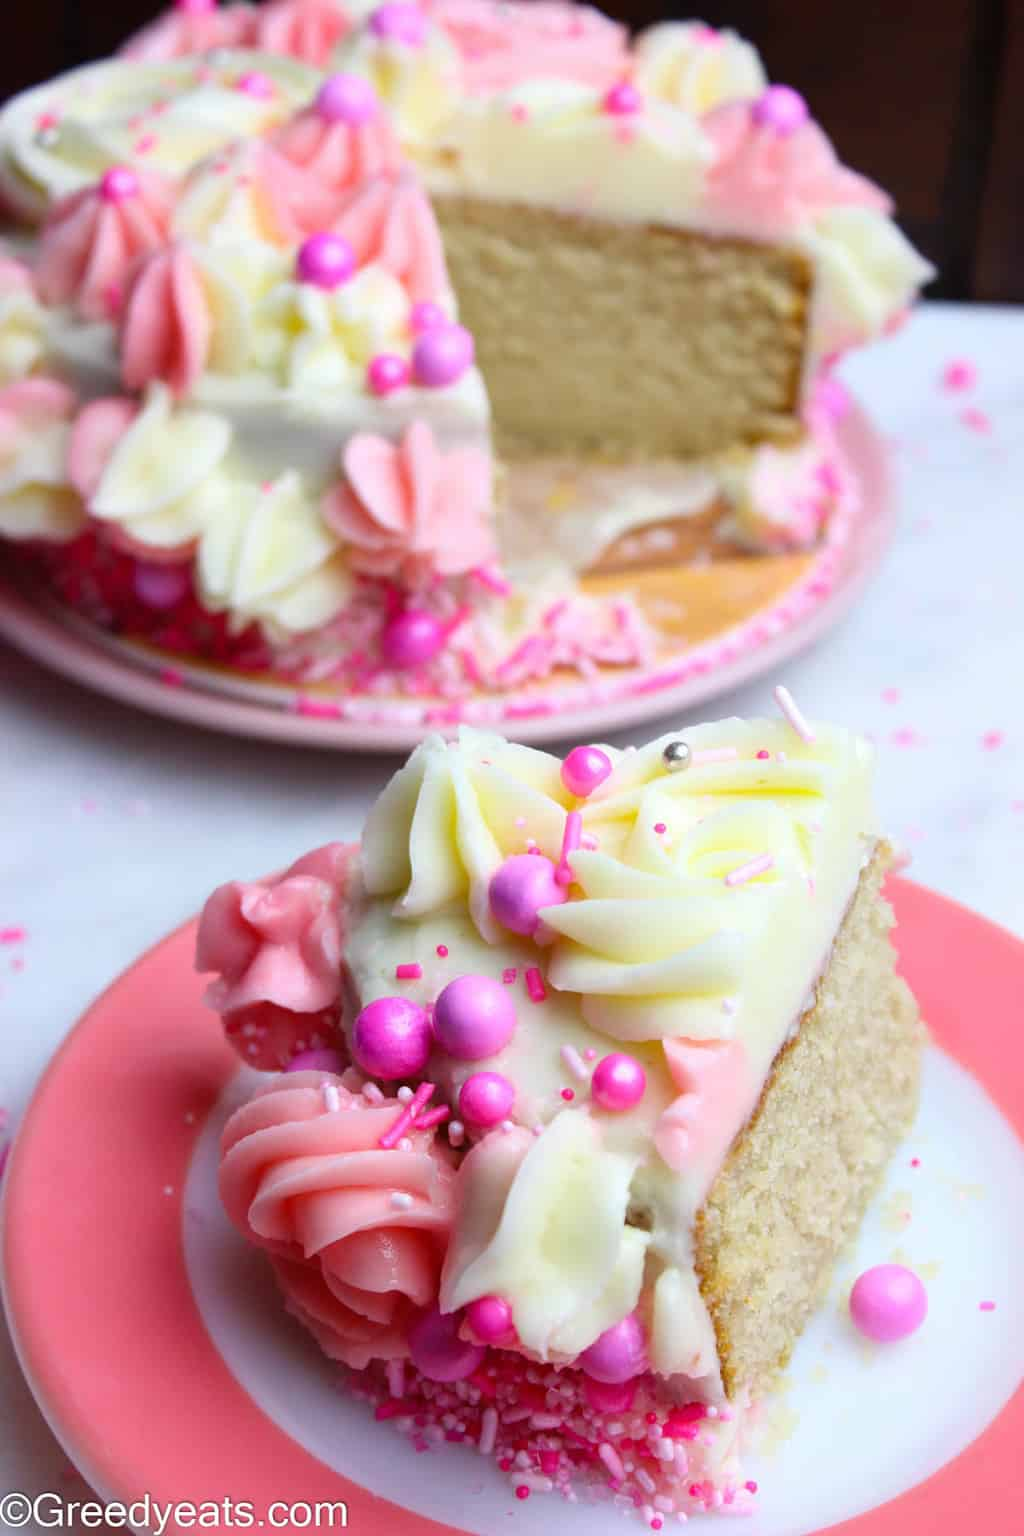 Easy vanilla cake with creamy vanilla buttercream frosting recipe on Greedyeats.com